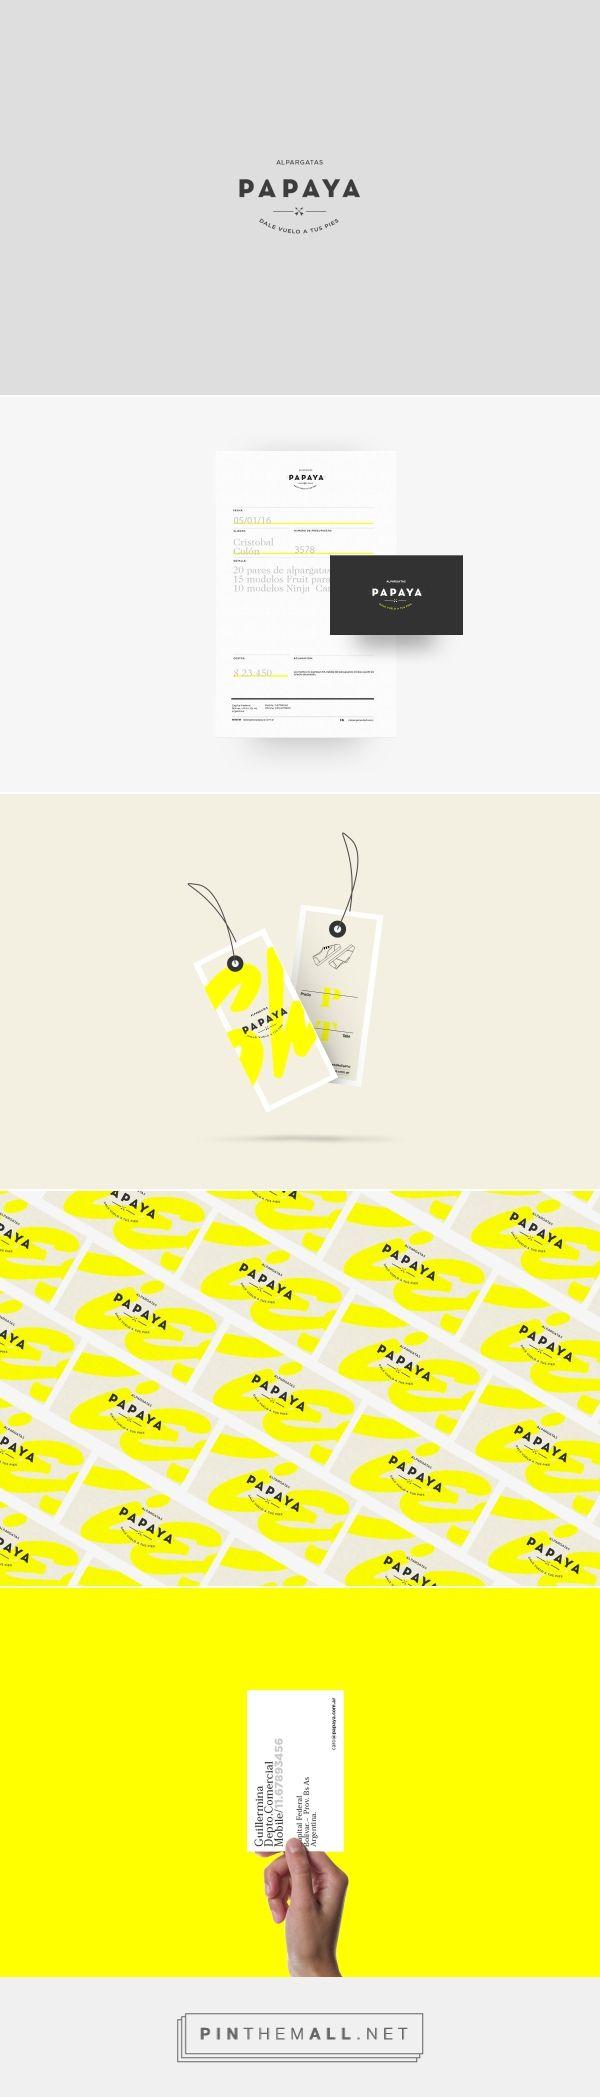 Papaya Shoe Company Branding by Buffalo Visual | Fivestar Branding Agency – Design and Branding Agency & Curated Inspiration Gallery